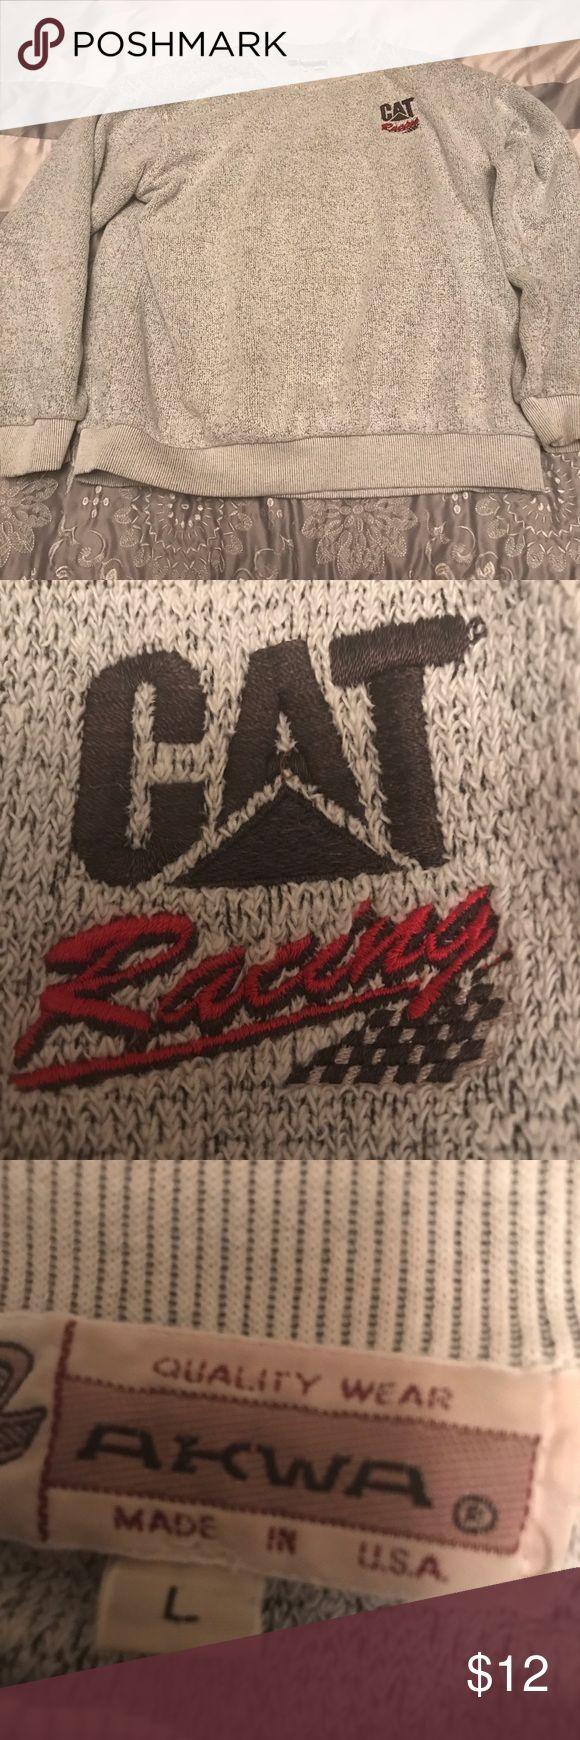 Men's Cat Racing sweater size large Men's Cat Racing light gray sweater-large Sweaters Crew & Scoop Necks